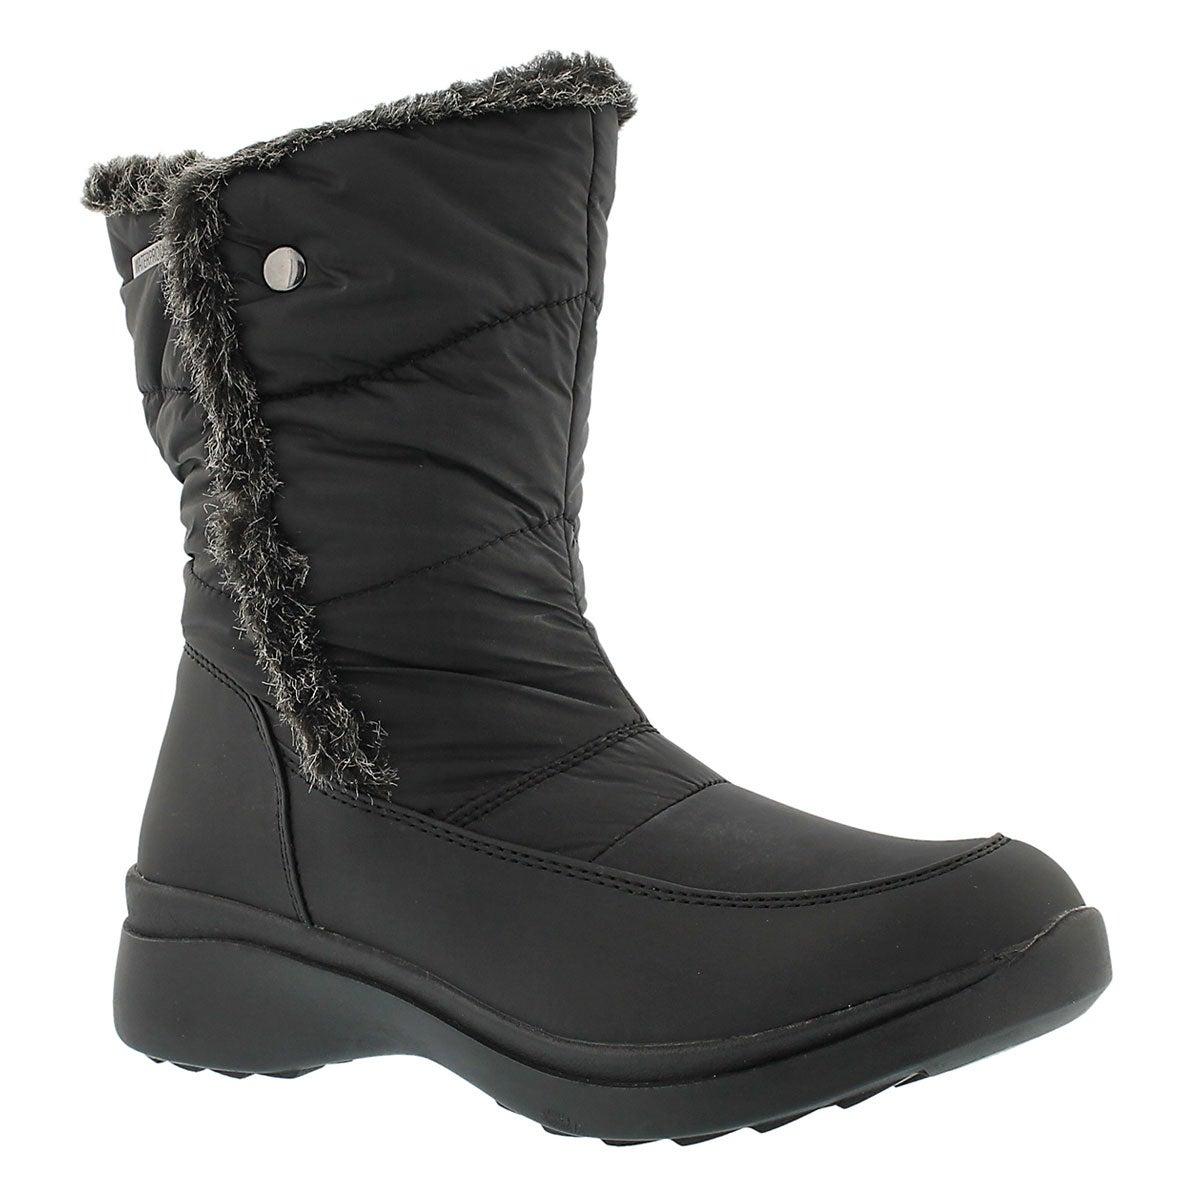 Lds Cassie blk wtpf lined winter boot